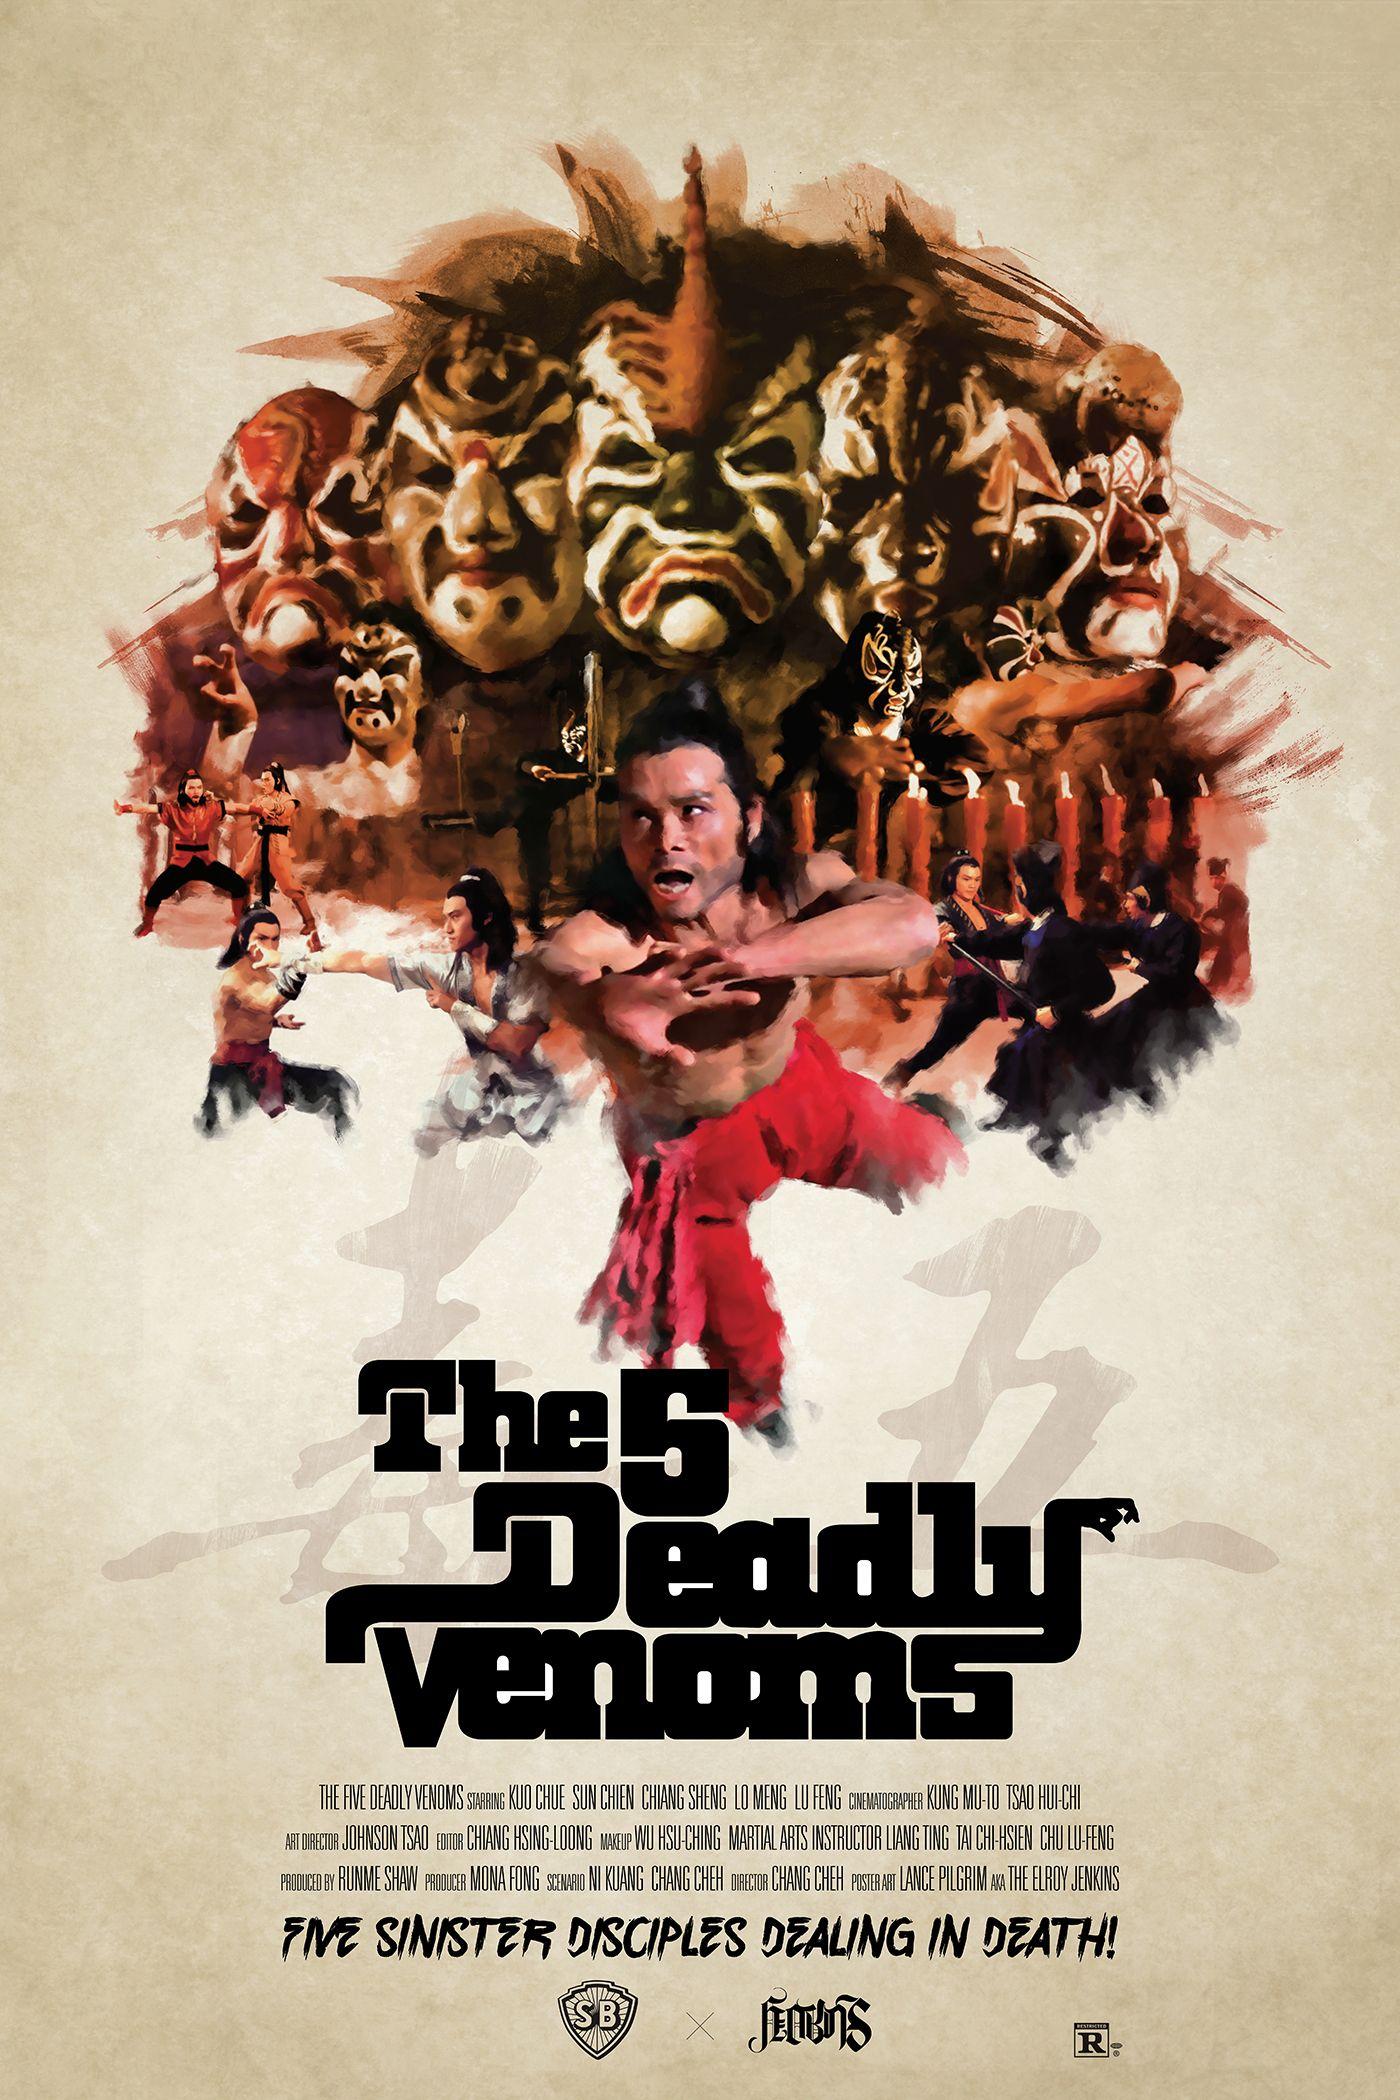 5 deadly venoms.jpg